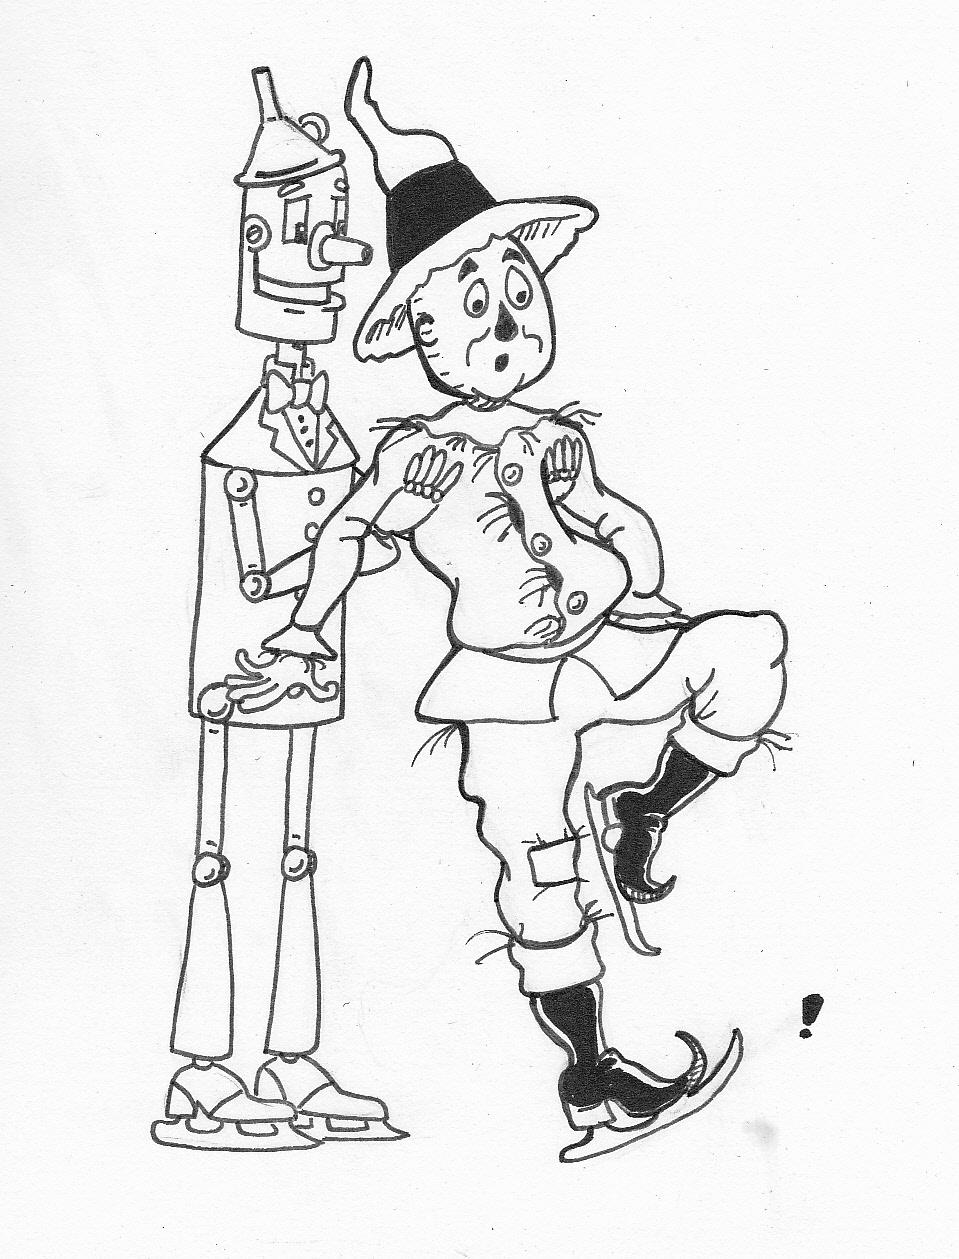 959x1259 Ice Skating Drawings Maldonado's Oz Art Drawings For Friends